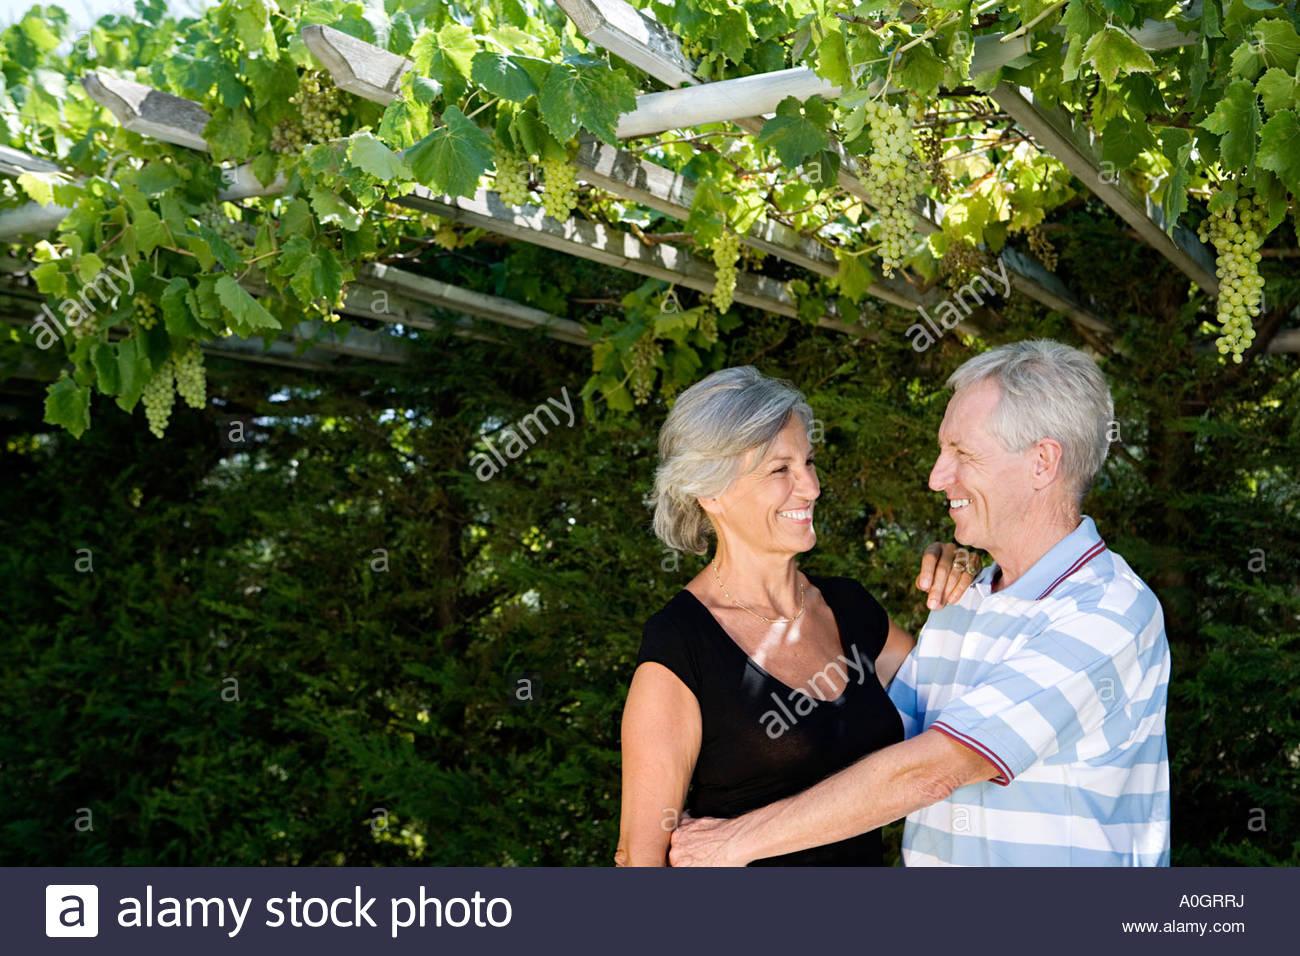 Paar unter Weinreben Stockbild